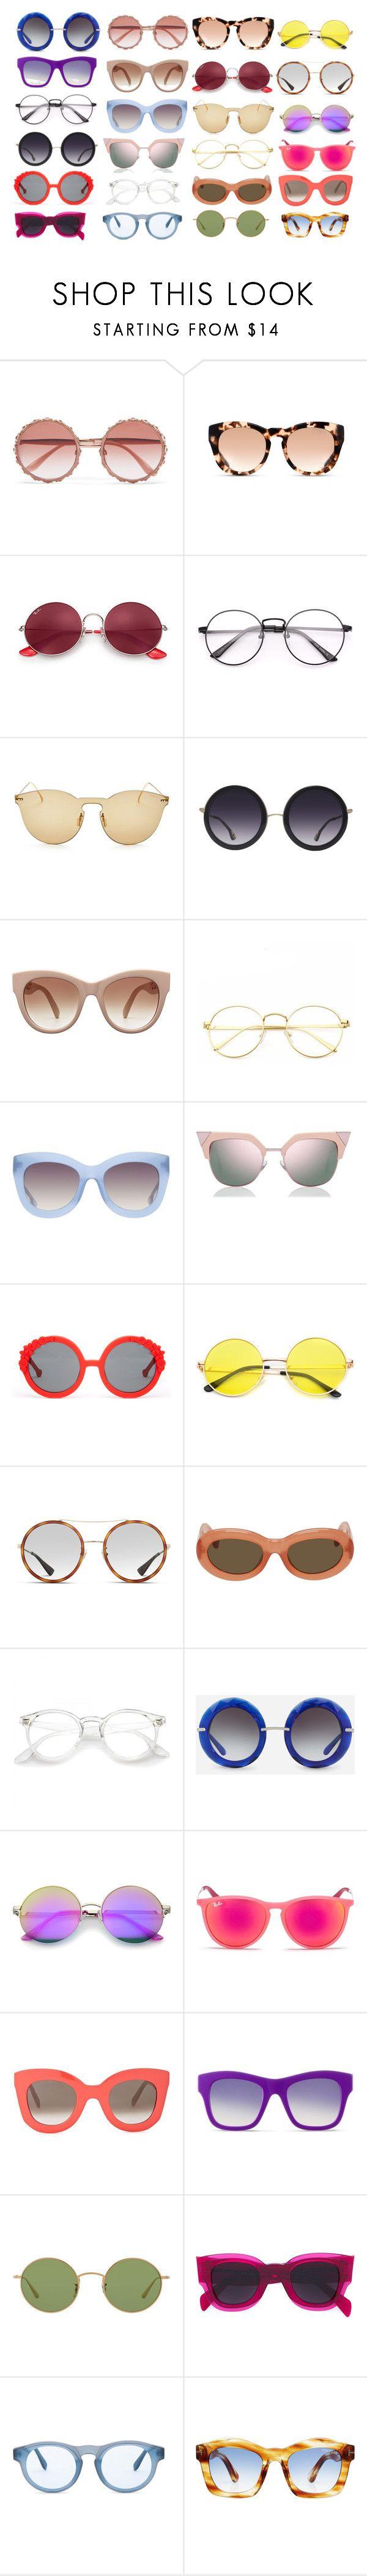 """Glasses"" by leloquevedo on Polyvore featuring moda, Dolce&Gabbana, Michael Kors, Ray-Ban, Illesteva, Alice + Olivia, STELLA McCARTNEY, Fendi, Preen y Gucci"